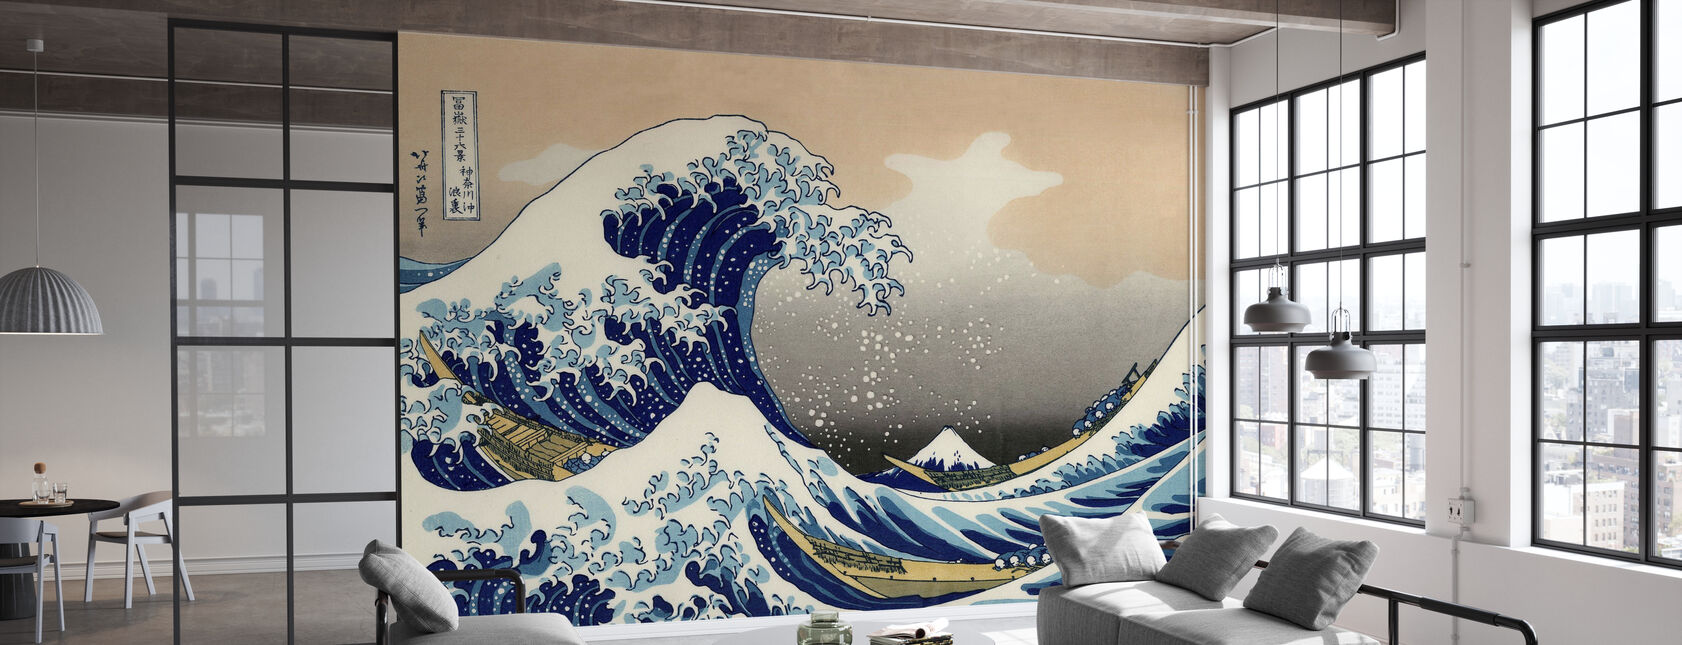 Suuri Aalto, Katsushika Hokusai - Tapetti - Toimisto